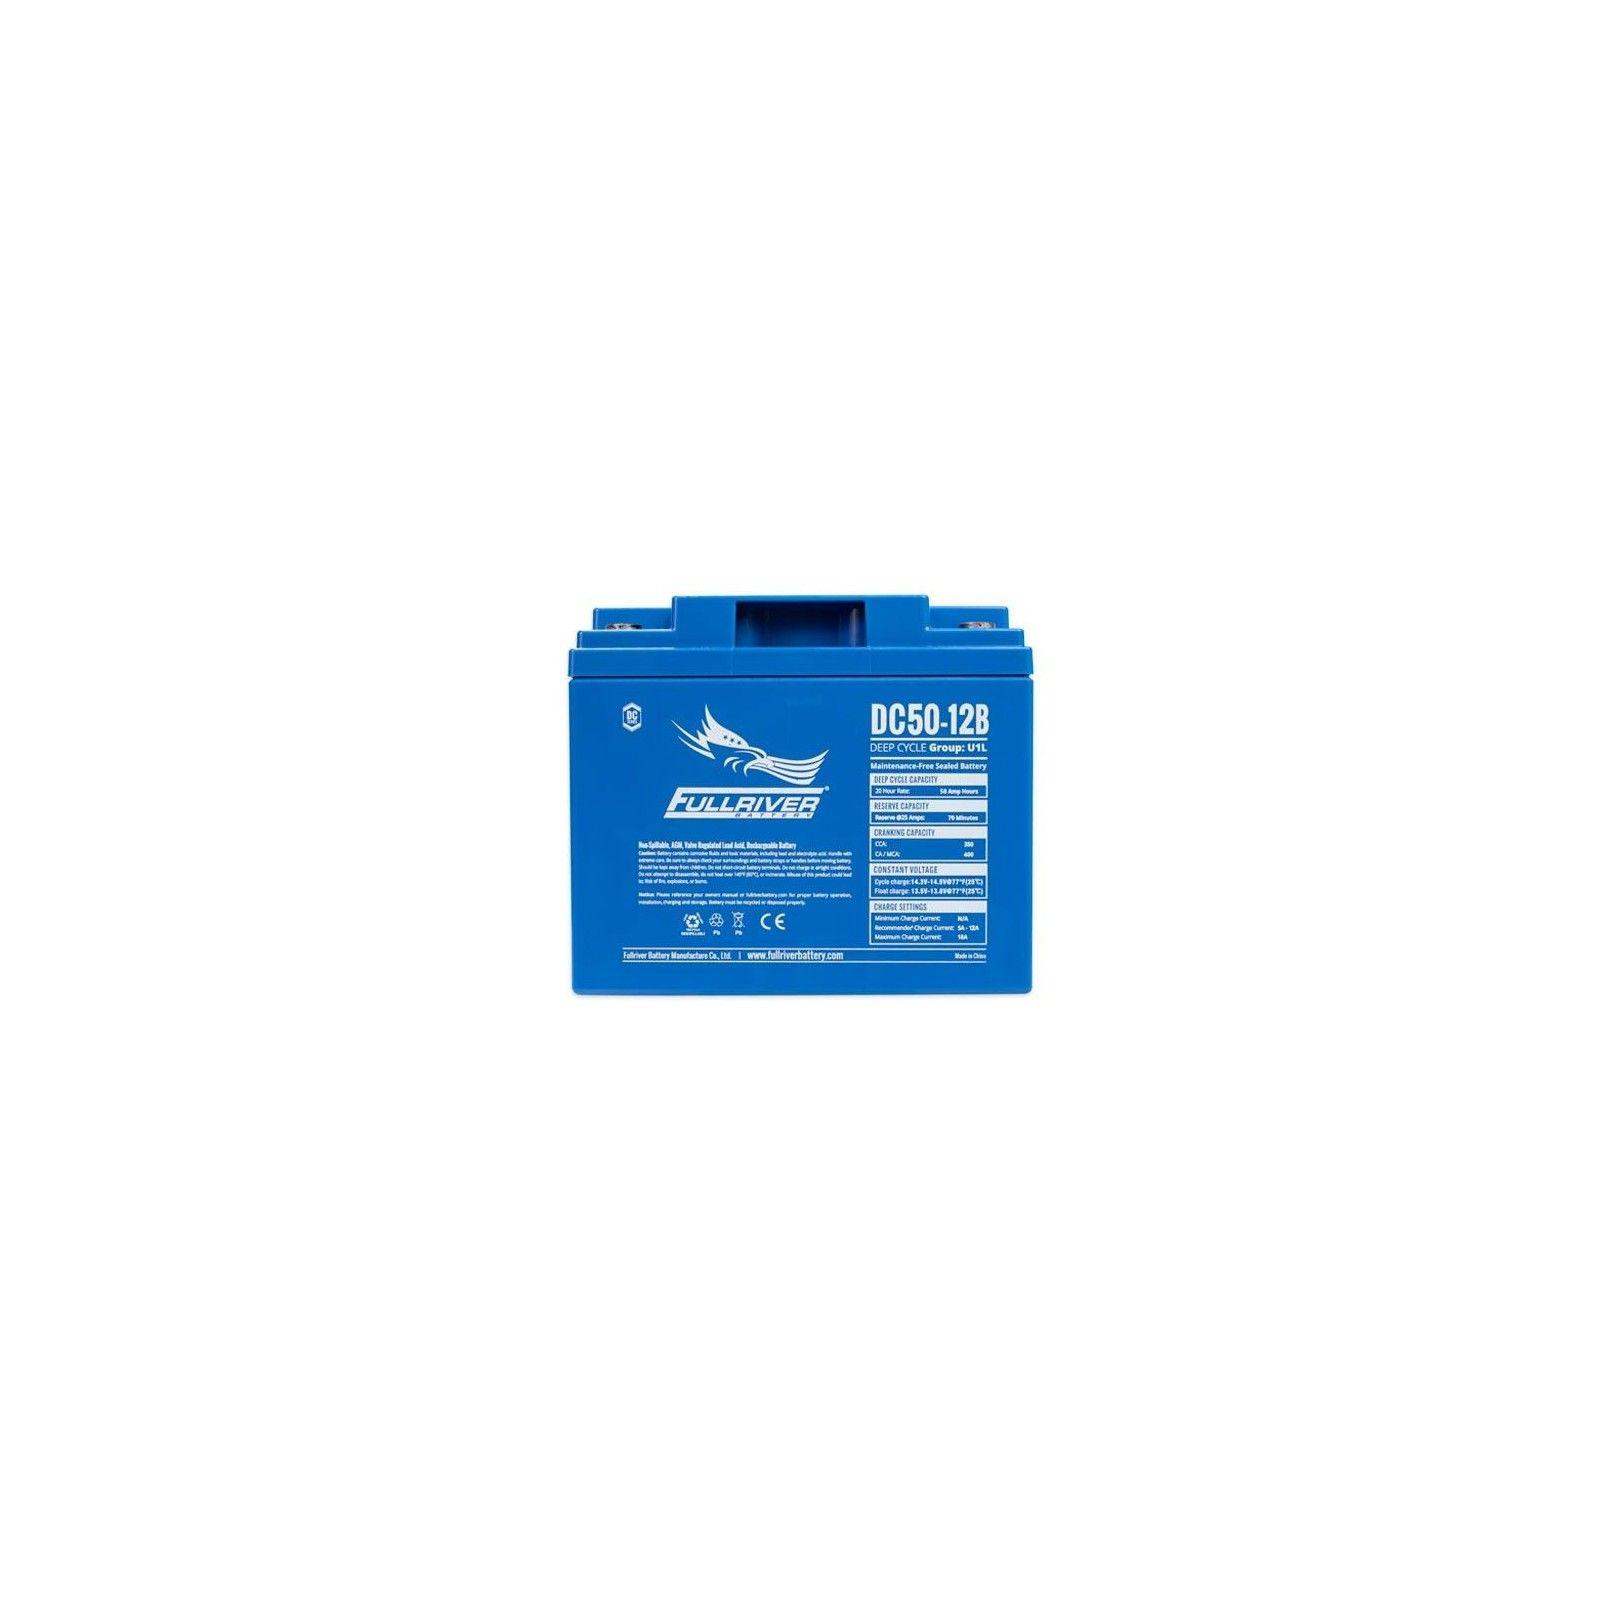 BATERIA Fullriver FULLRIVER DC50-12B 50Ah 350A 12V FULLRIVER - 1